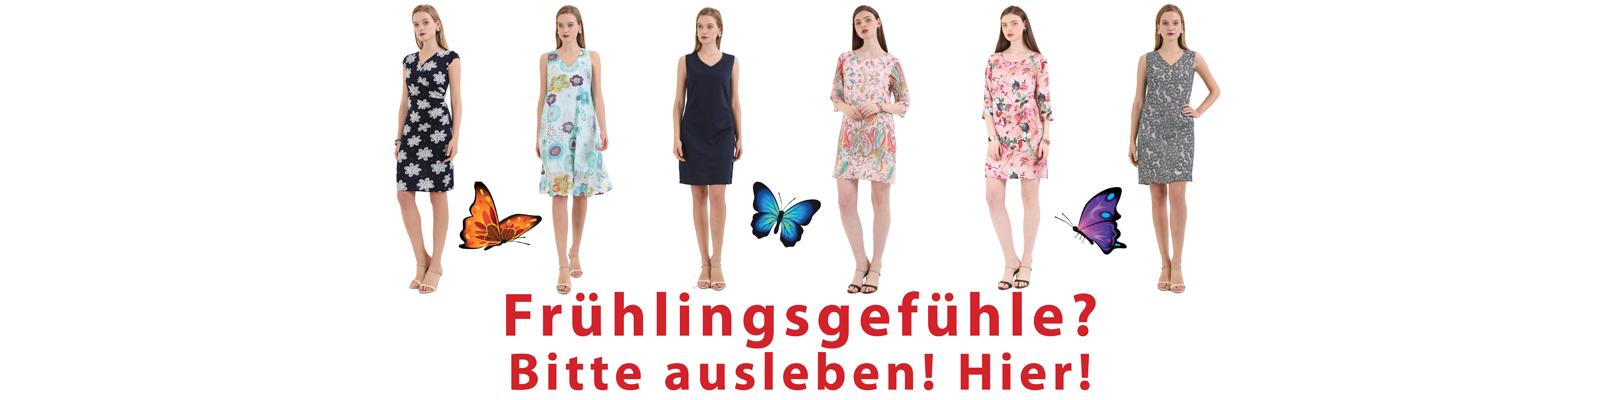 FAMOS 2018 Frühlingskleider Sommerkleider